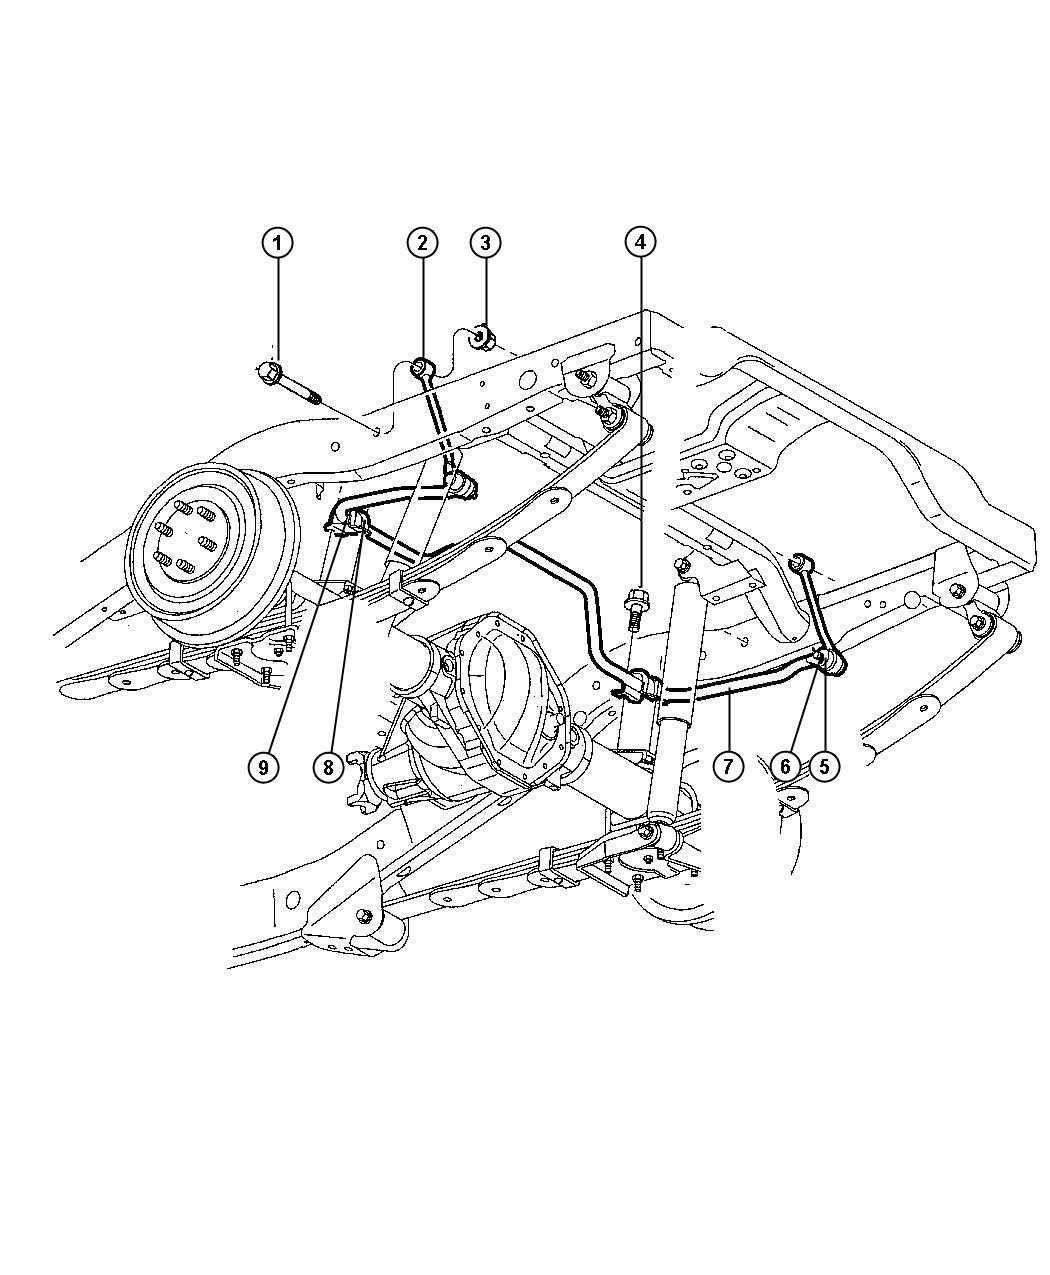 dodge dakota suspension parts diagram 1989 yamaha g2 wiring front best